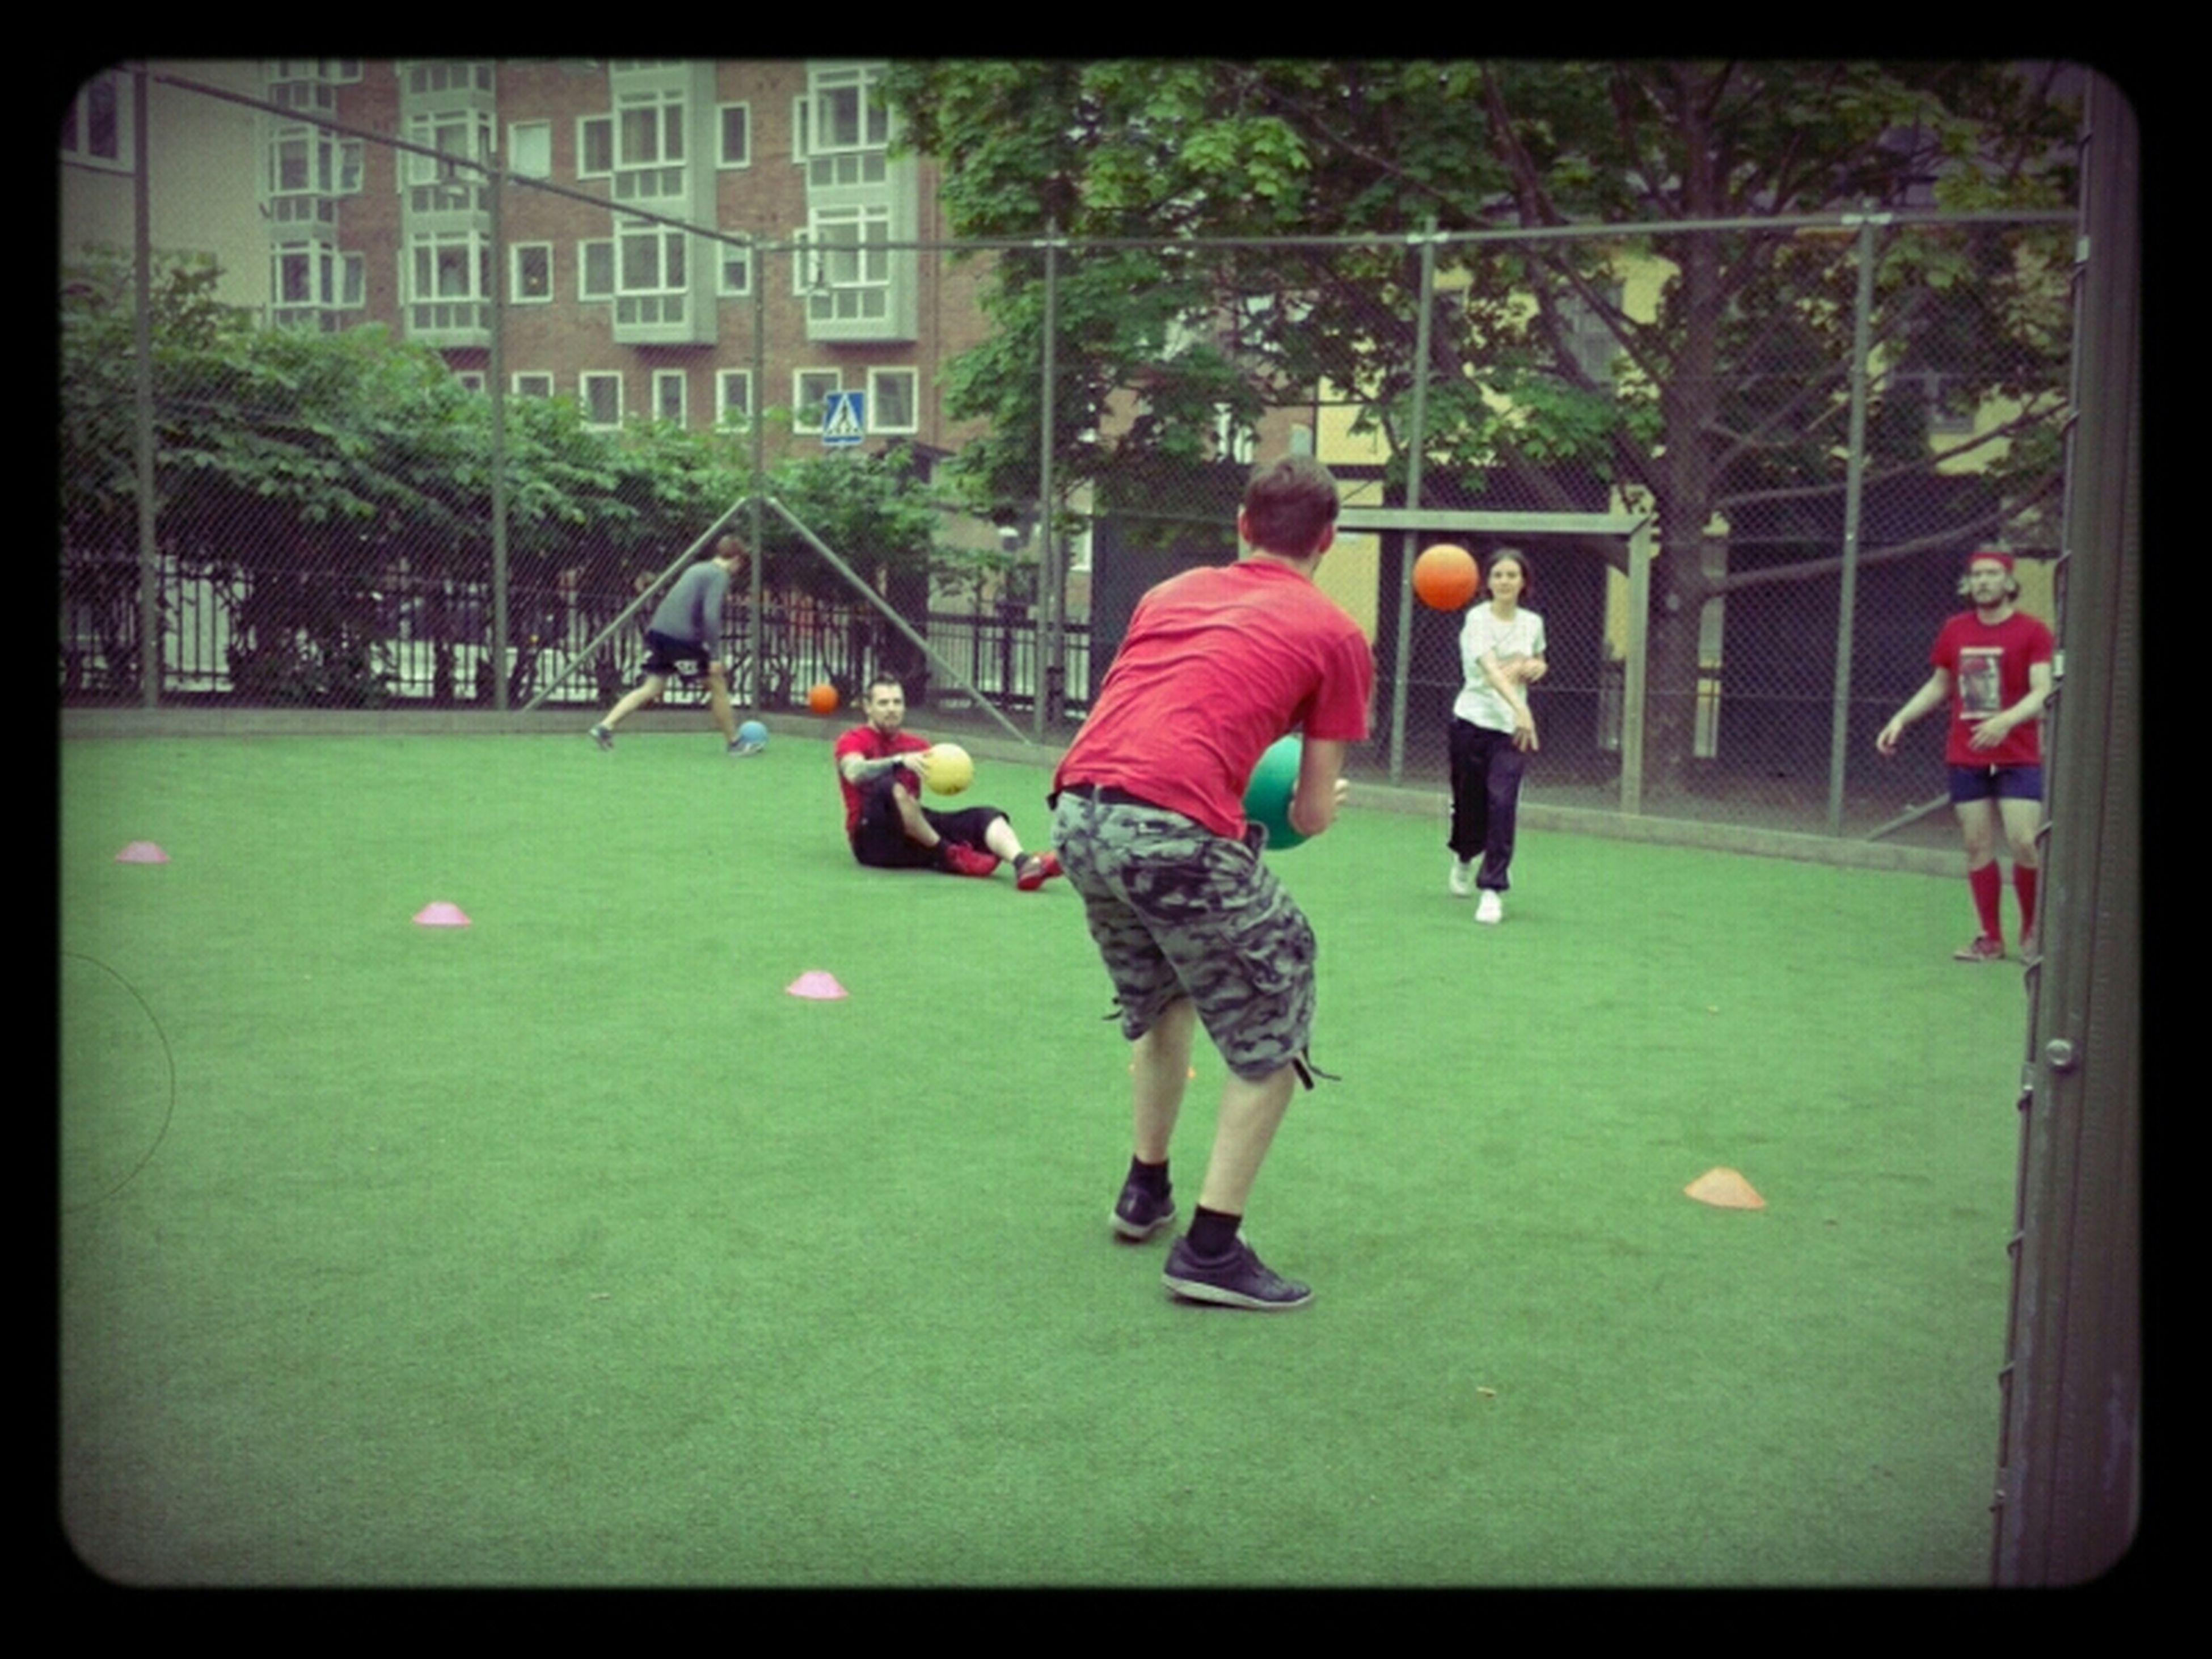 first time playing dodgeball, with cool kids. Dodgeball Association Björkgårds Skolan